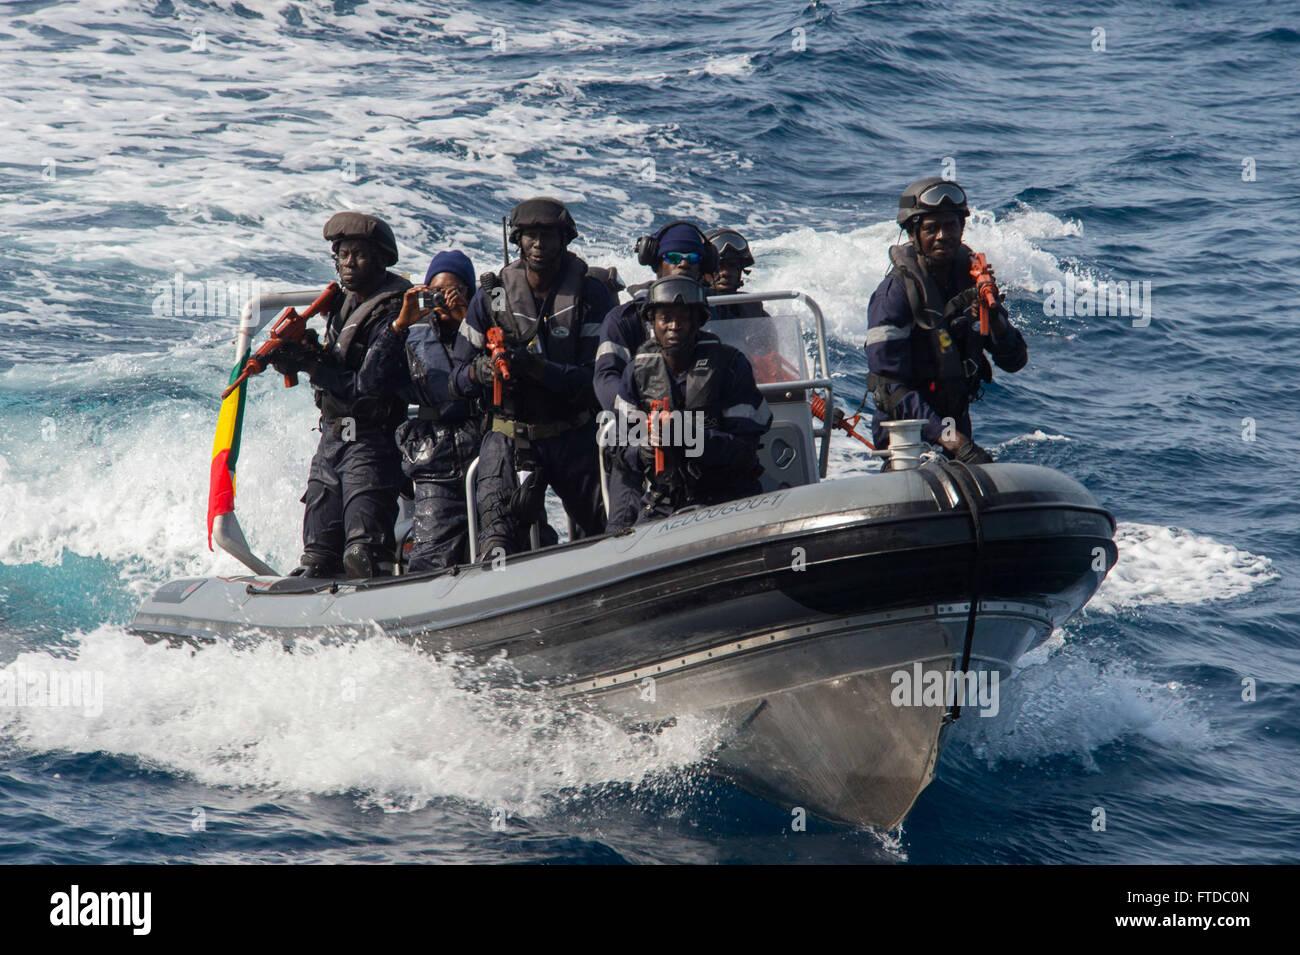 150425-N-TC720-029 ATLANTIC OCEAN (April 25, 2015) Members of the Senegalese military approach the Portuguese navy - Stock Image